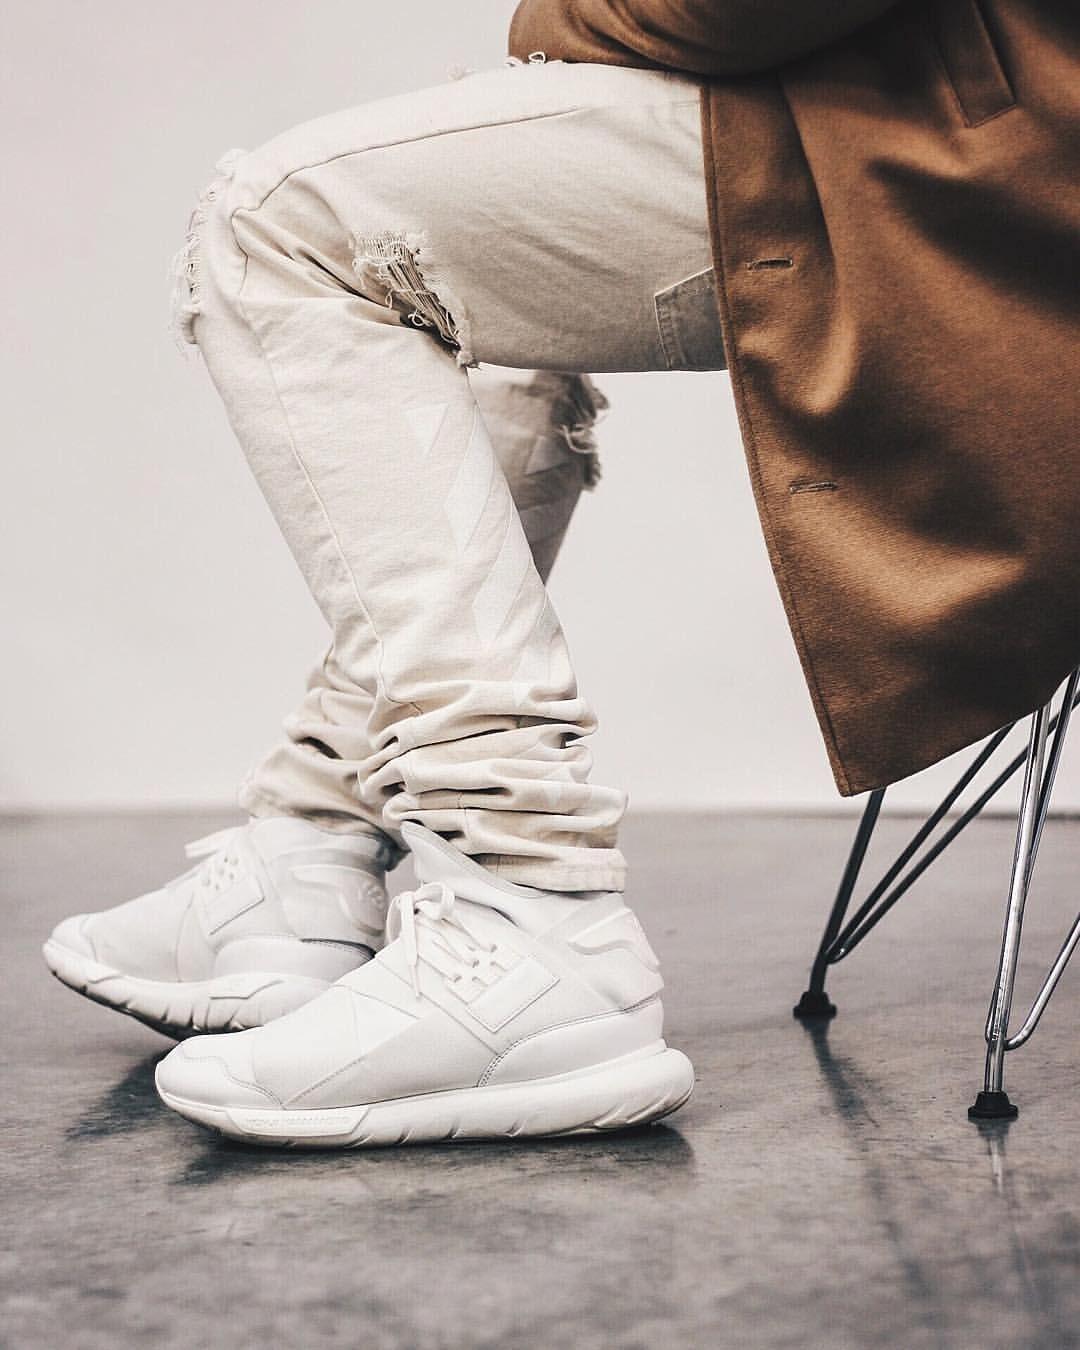 Adidas Y-3 Qasa: Off White